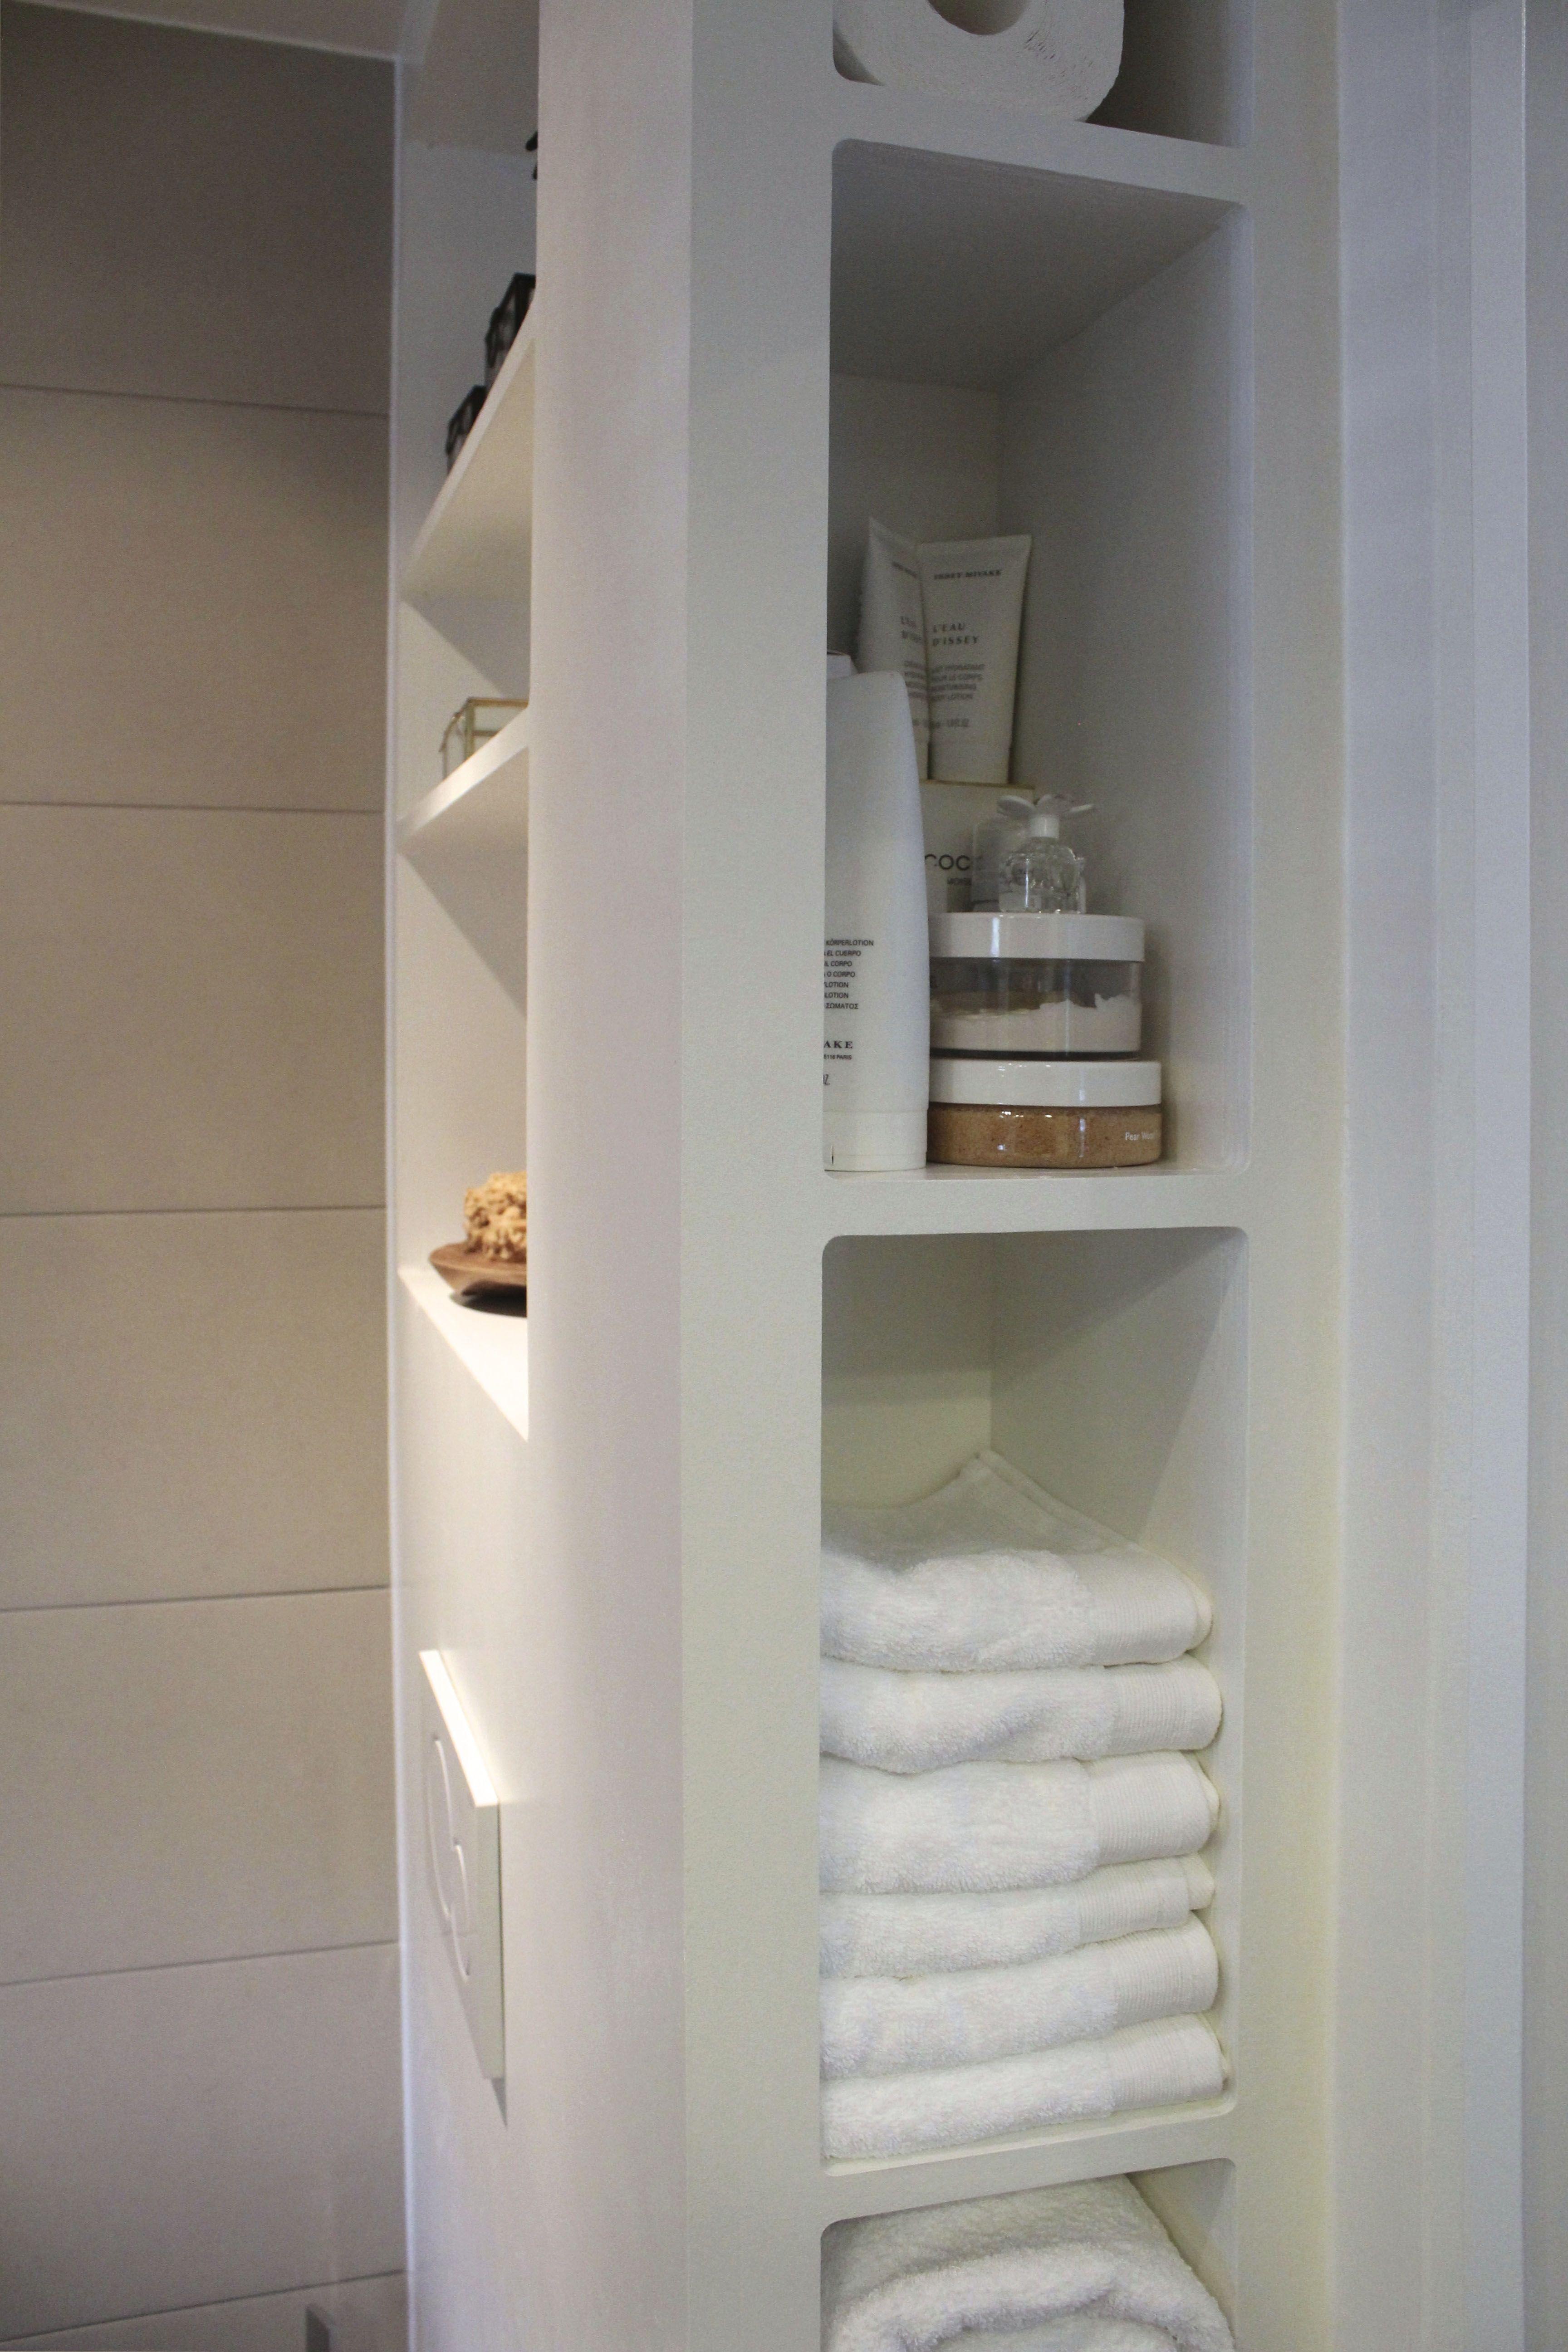 Badkamer inbouw nisjes   Badkamer ideeën   Pinterest